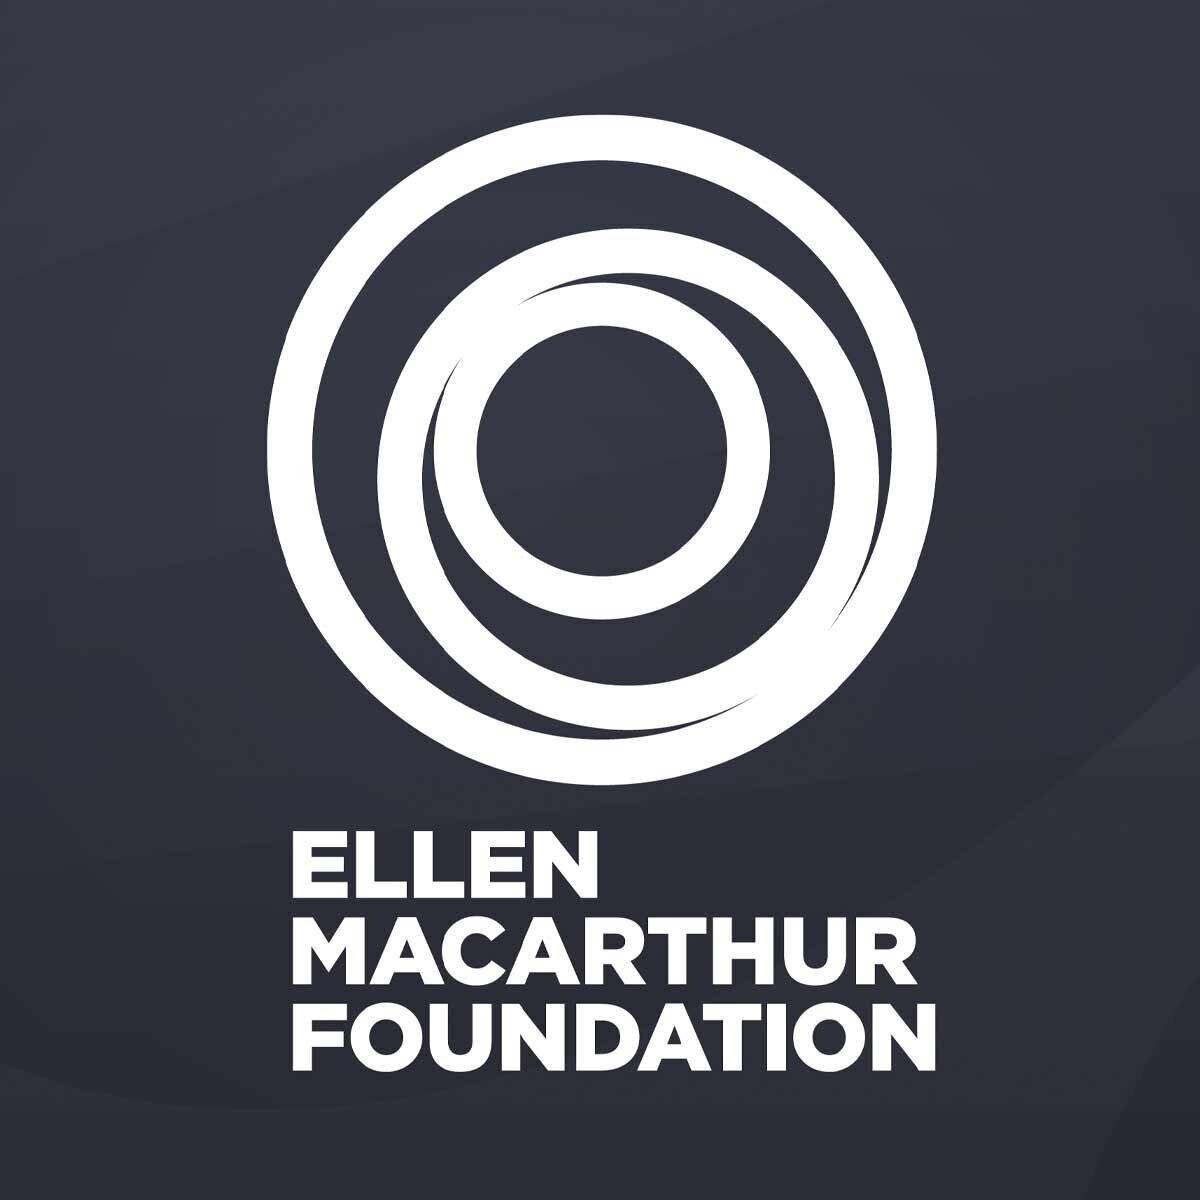 Logo for the Ellen MacArthur Foundation